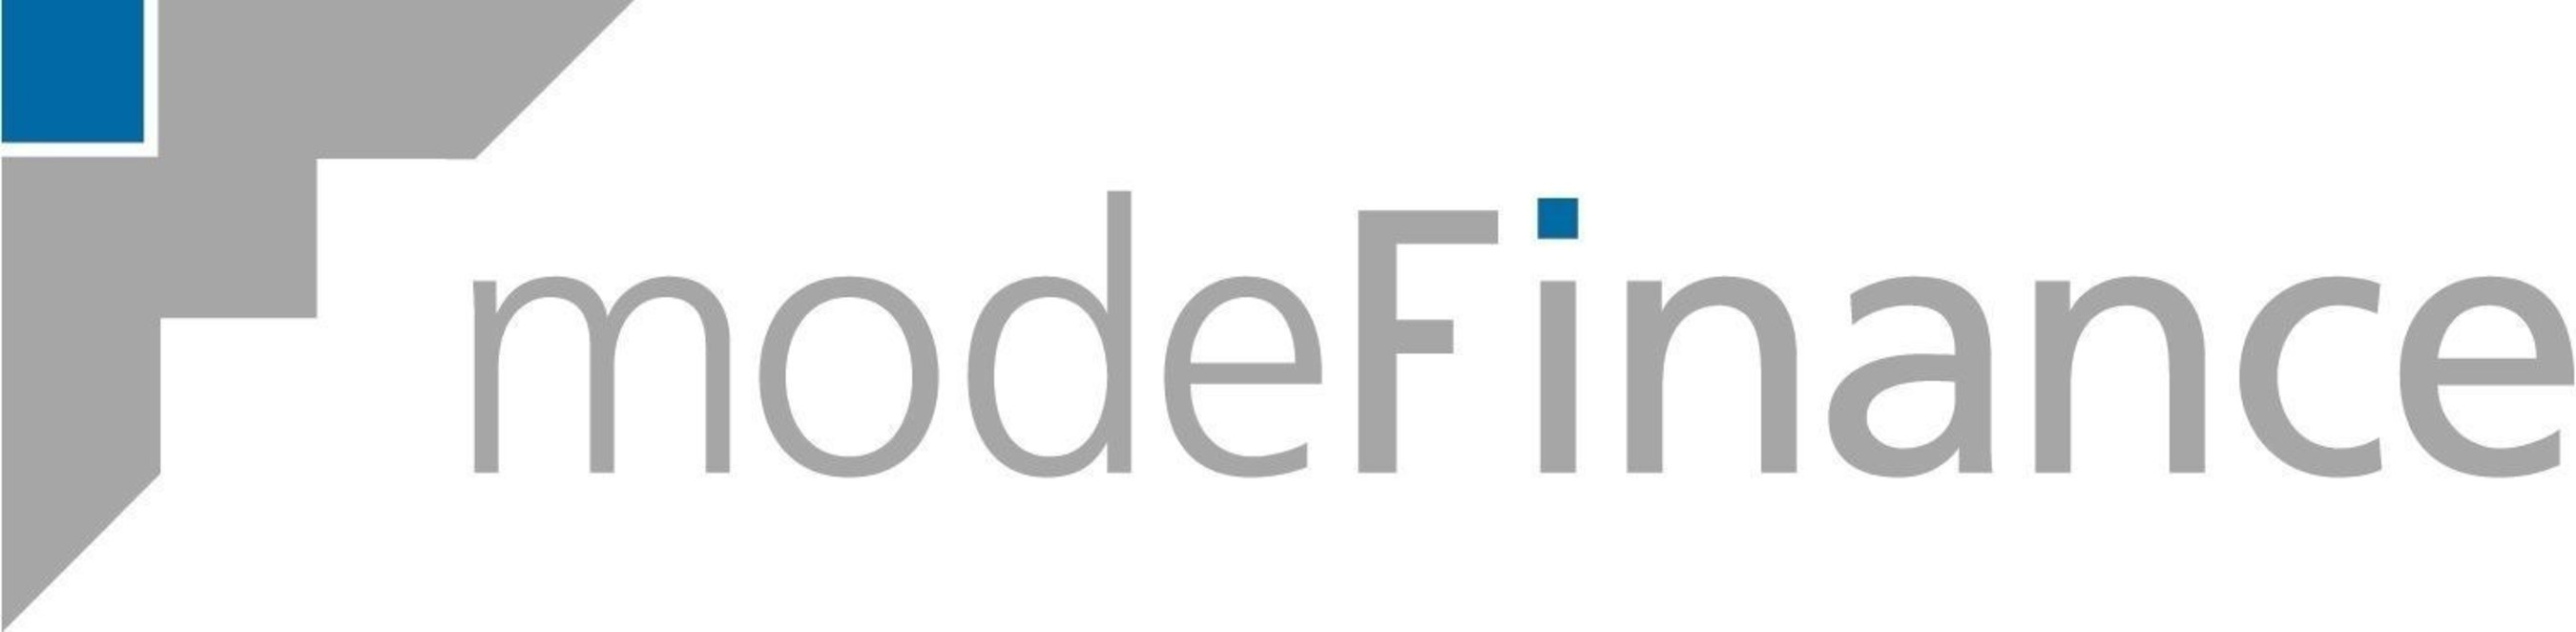 modeFinance is Europe's first Fintech Ratings Agency (PRNewsFoto/modeFinance)